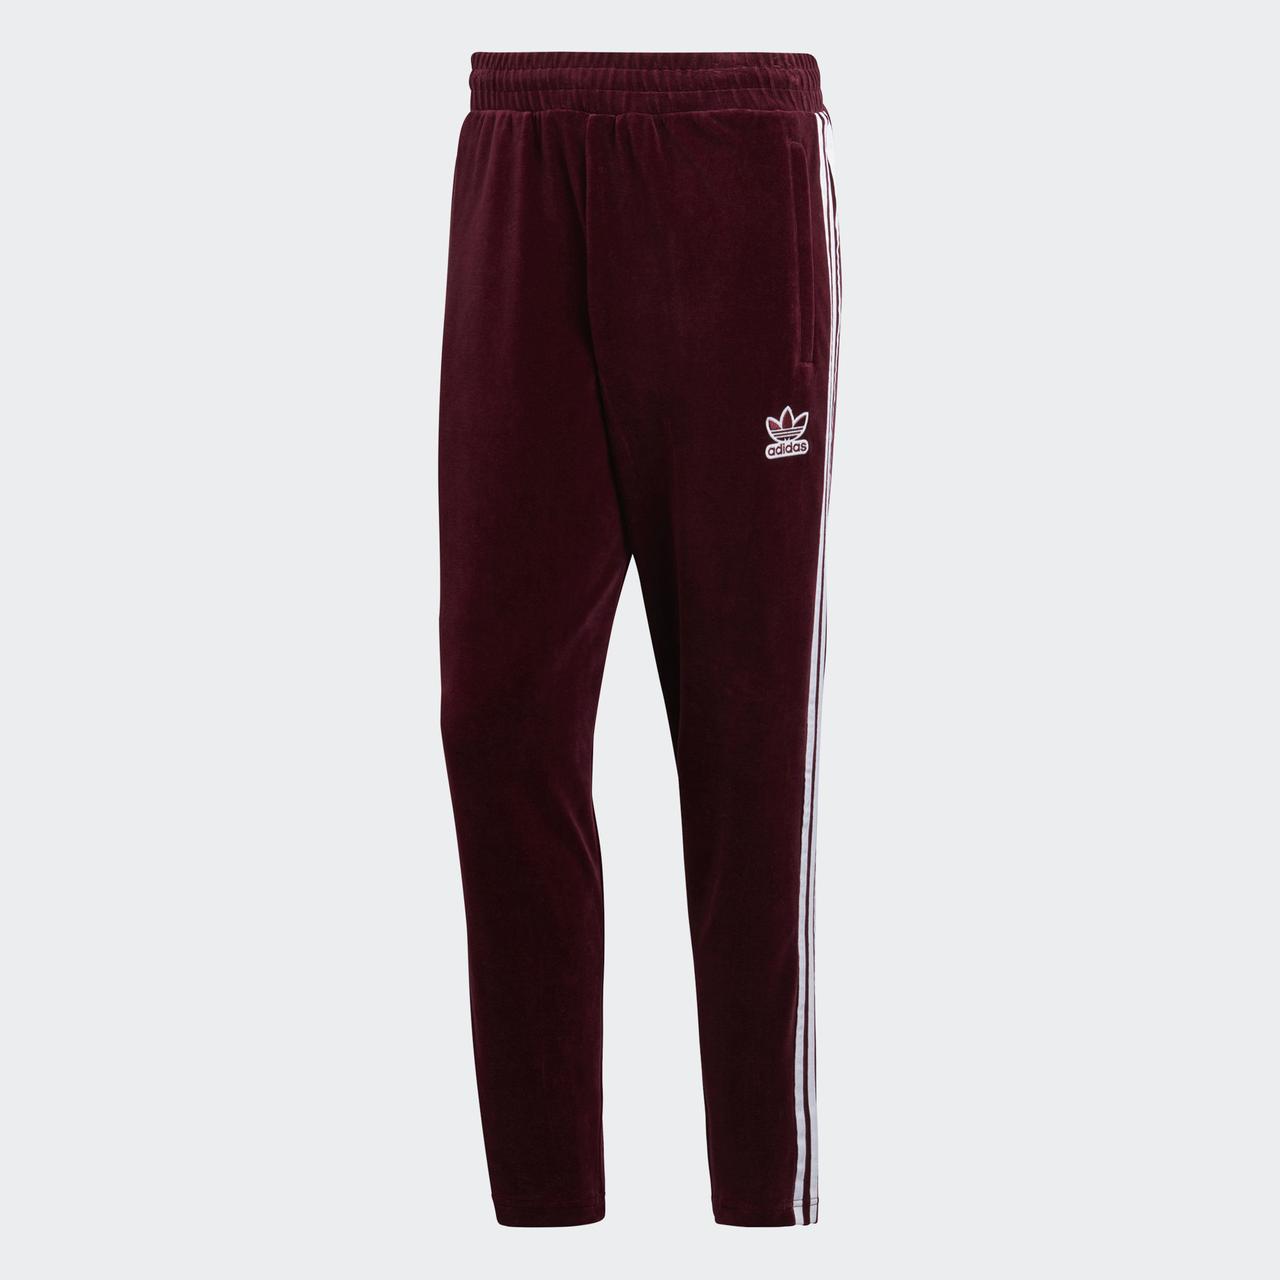 Мужские брюки Adidas Originals Beckenbauer Velour (Артикул: DH5784)